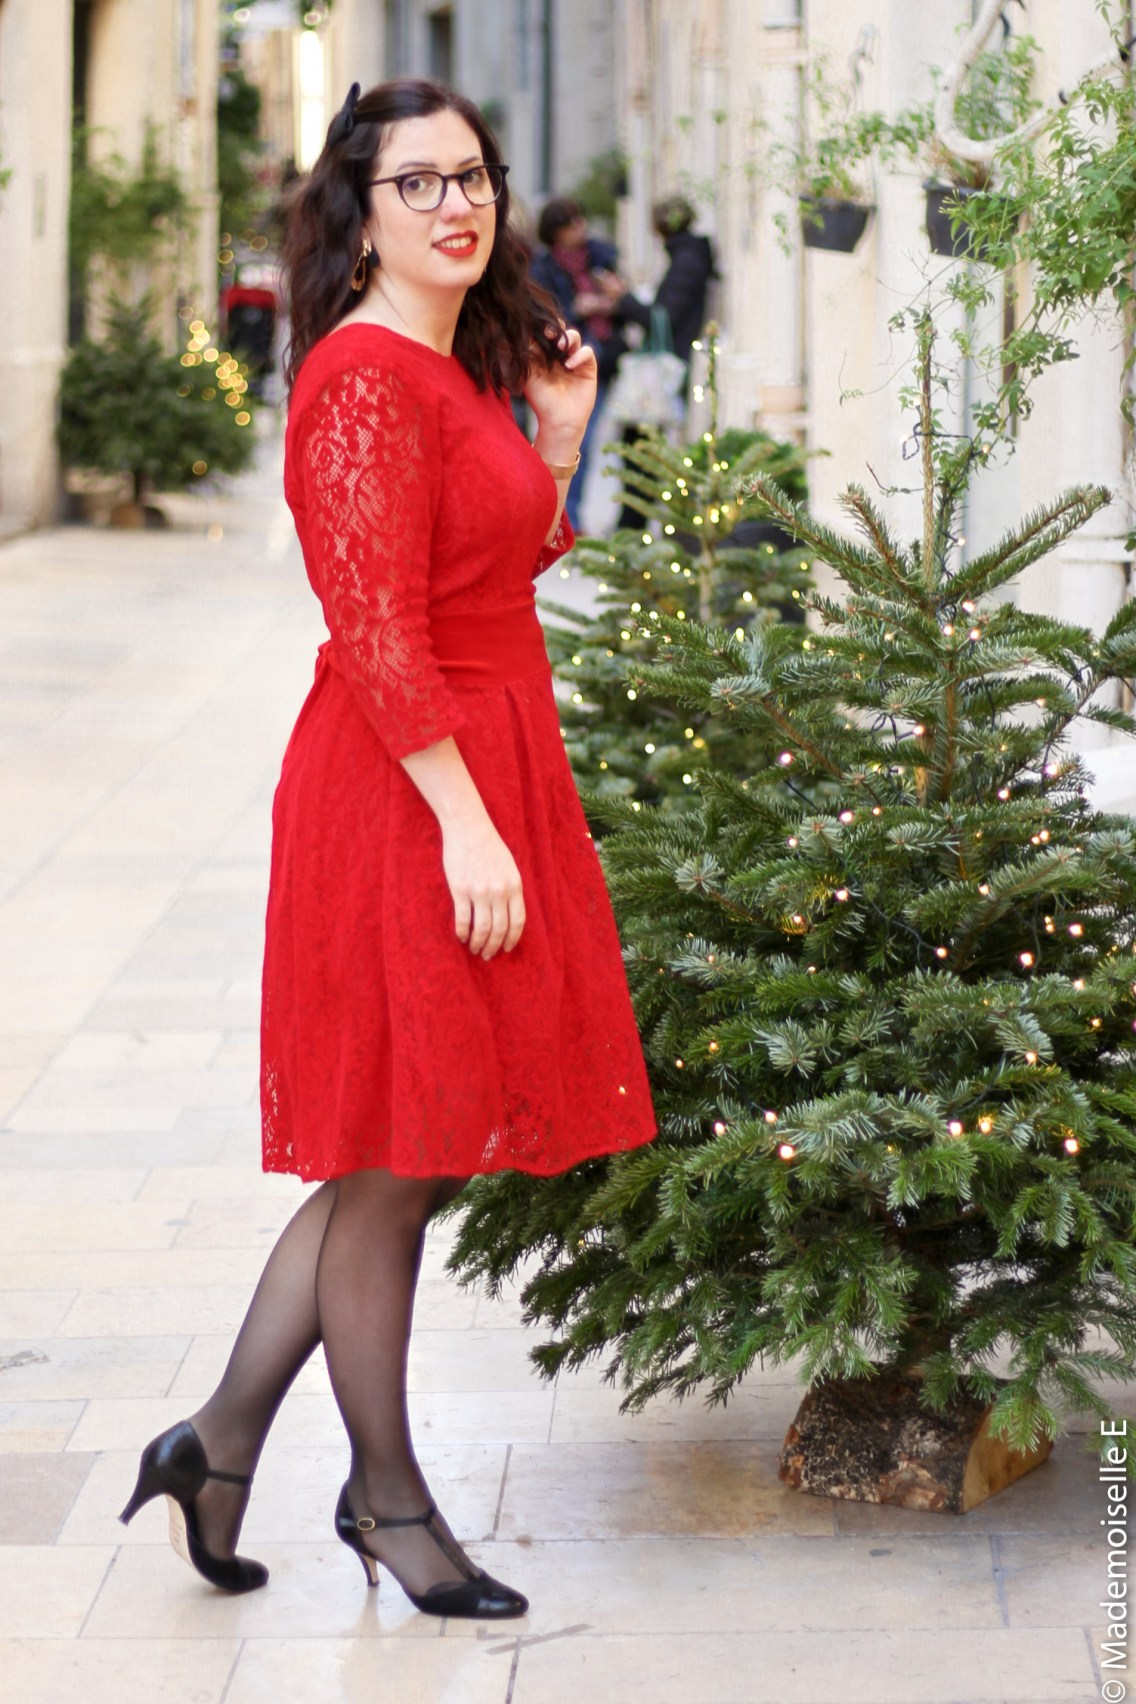 Robe rouge look de noel 6 mademoiselle-e